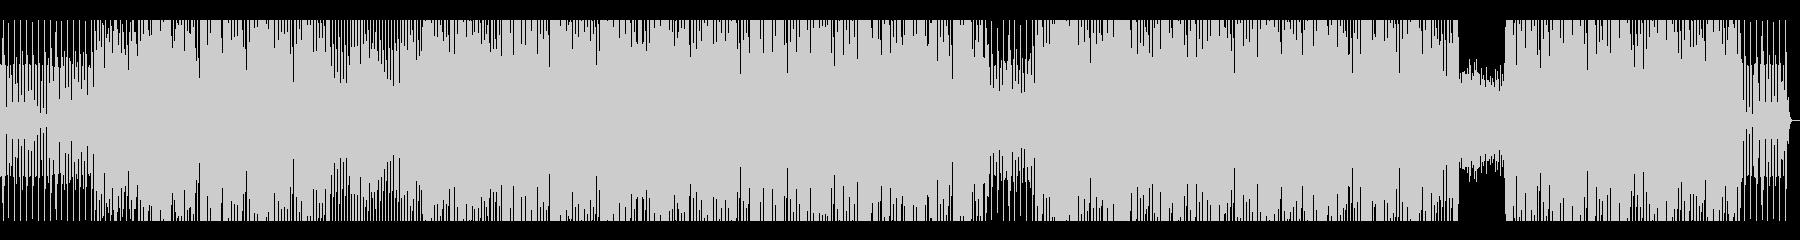 Piano house系インストの未再生の波形